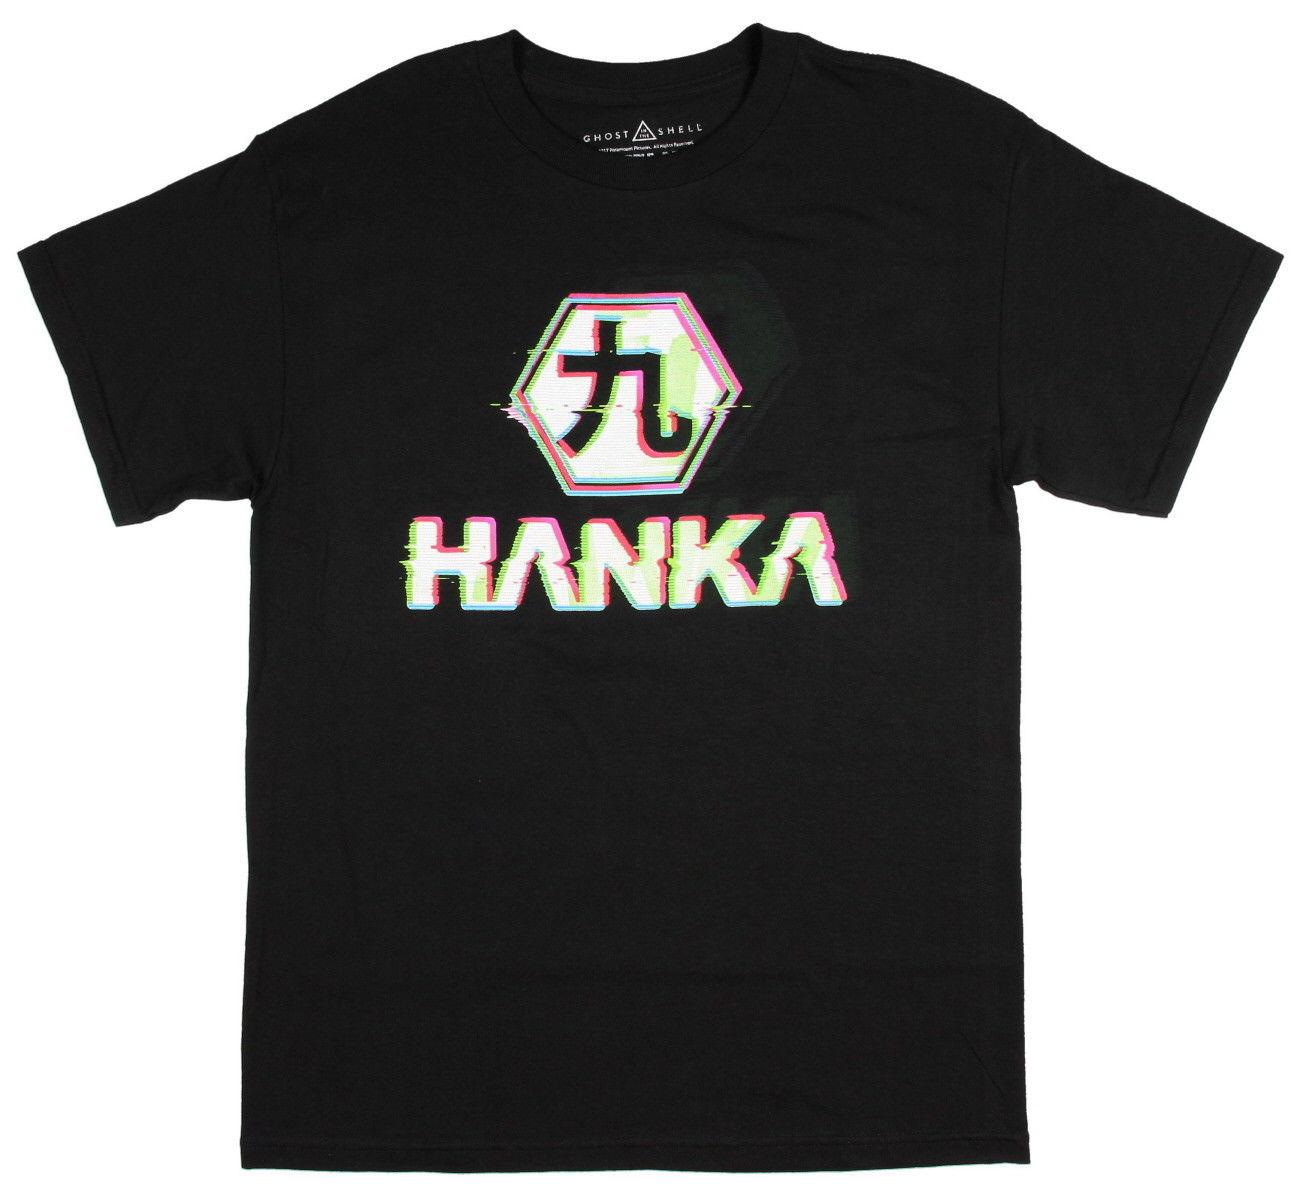 2019 neueste Brief Drucken Ghost In The Shell Hanka Robotik Japanischen Seinen Manga Männer T-shirt T-shirt Casual Mann tees